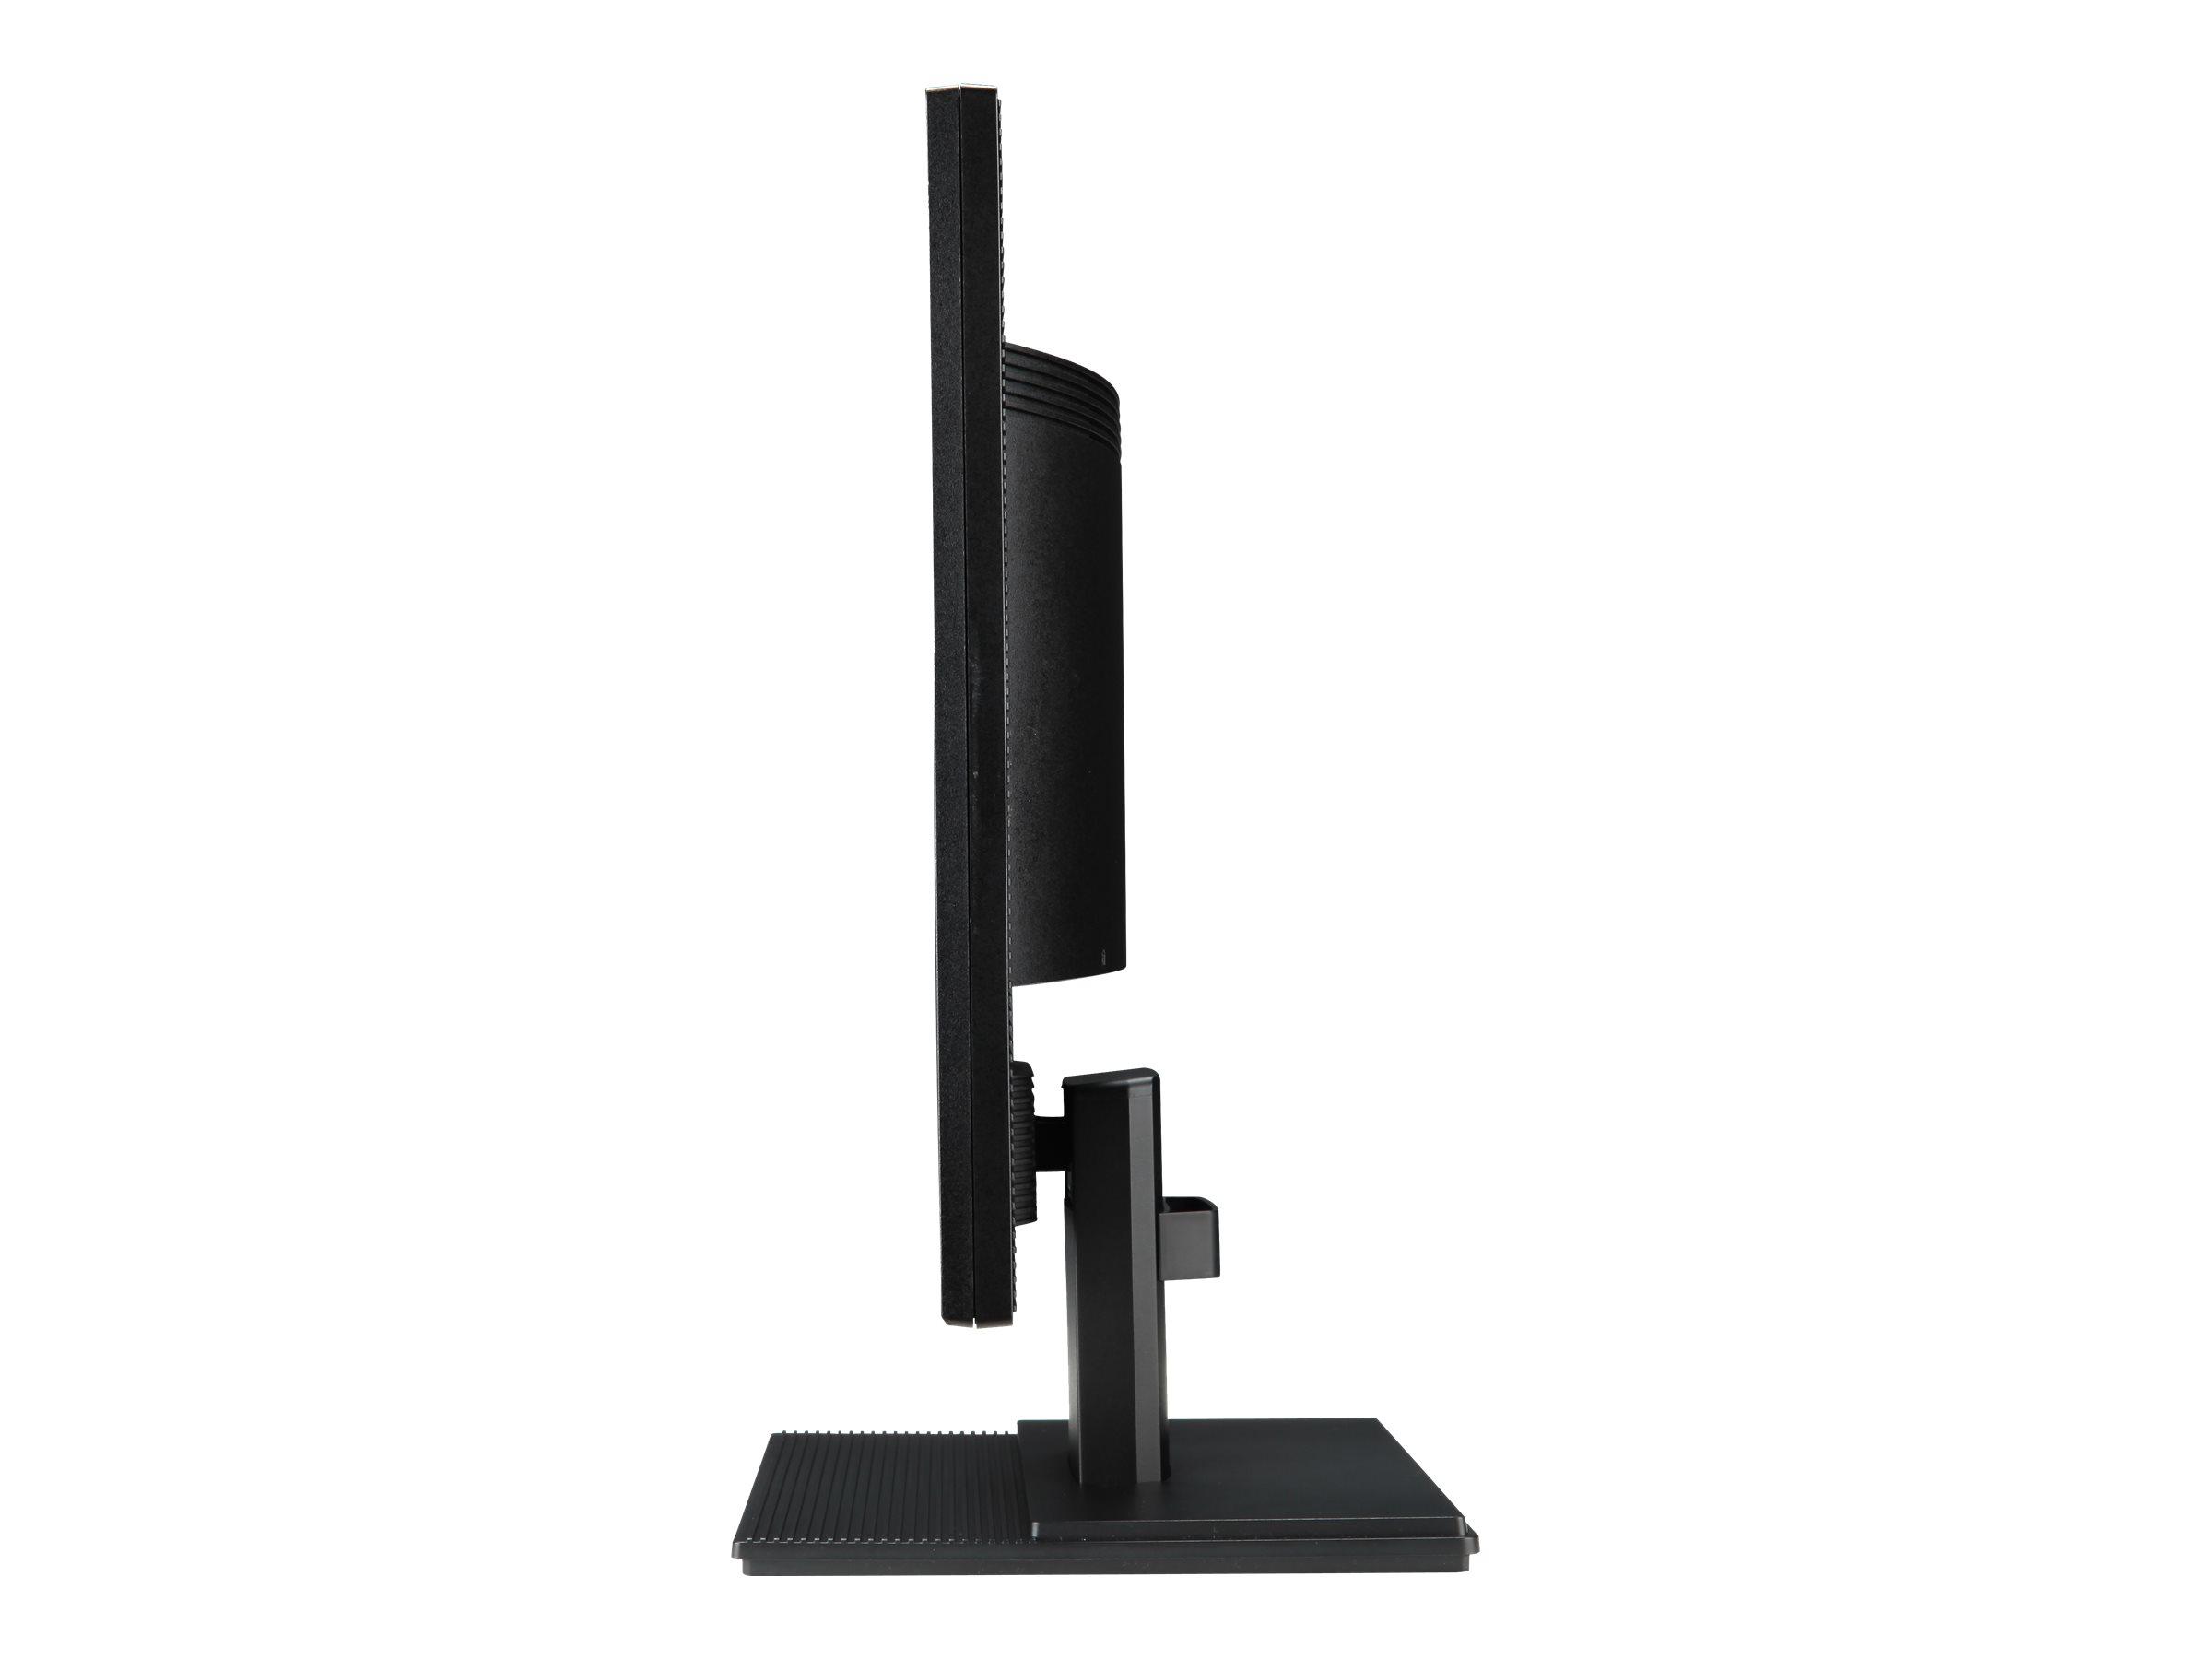 "V206HQL - 19.5"" LED/5ms/Black (UM.IV6EE.B01) - Achat / Vente Ecran PC sur Picata.fr - 1"